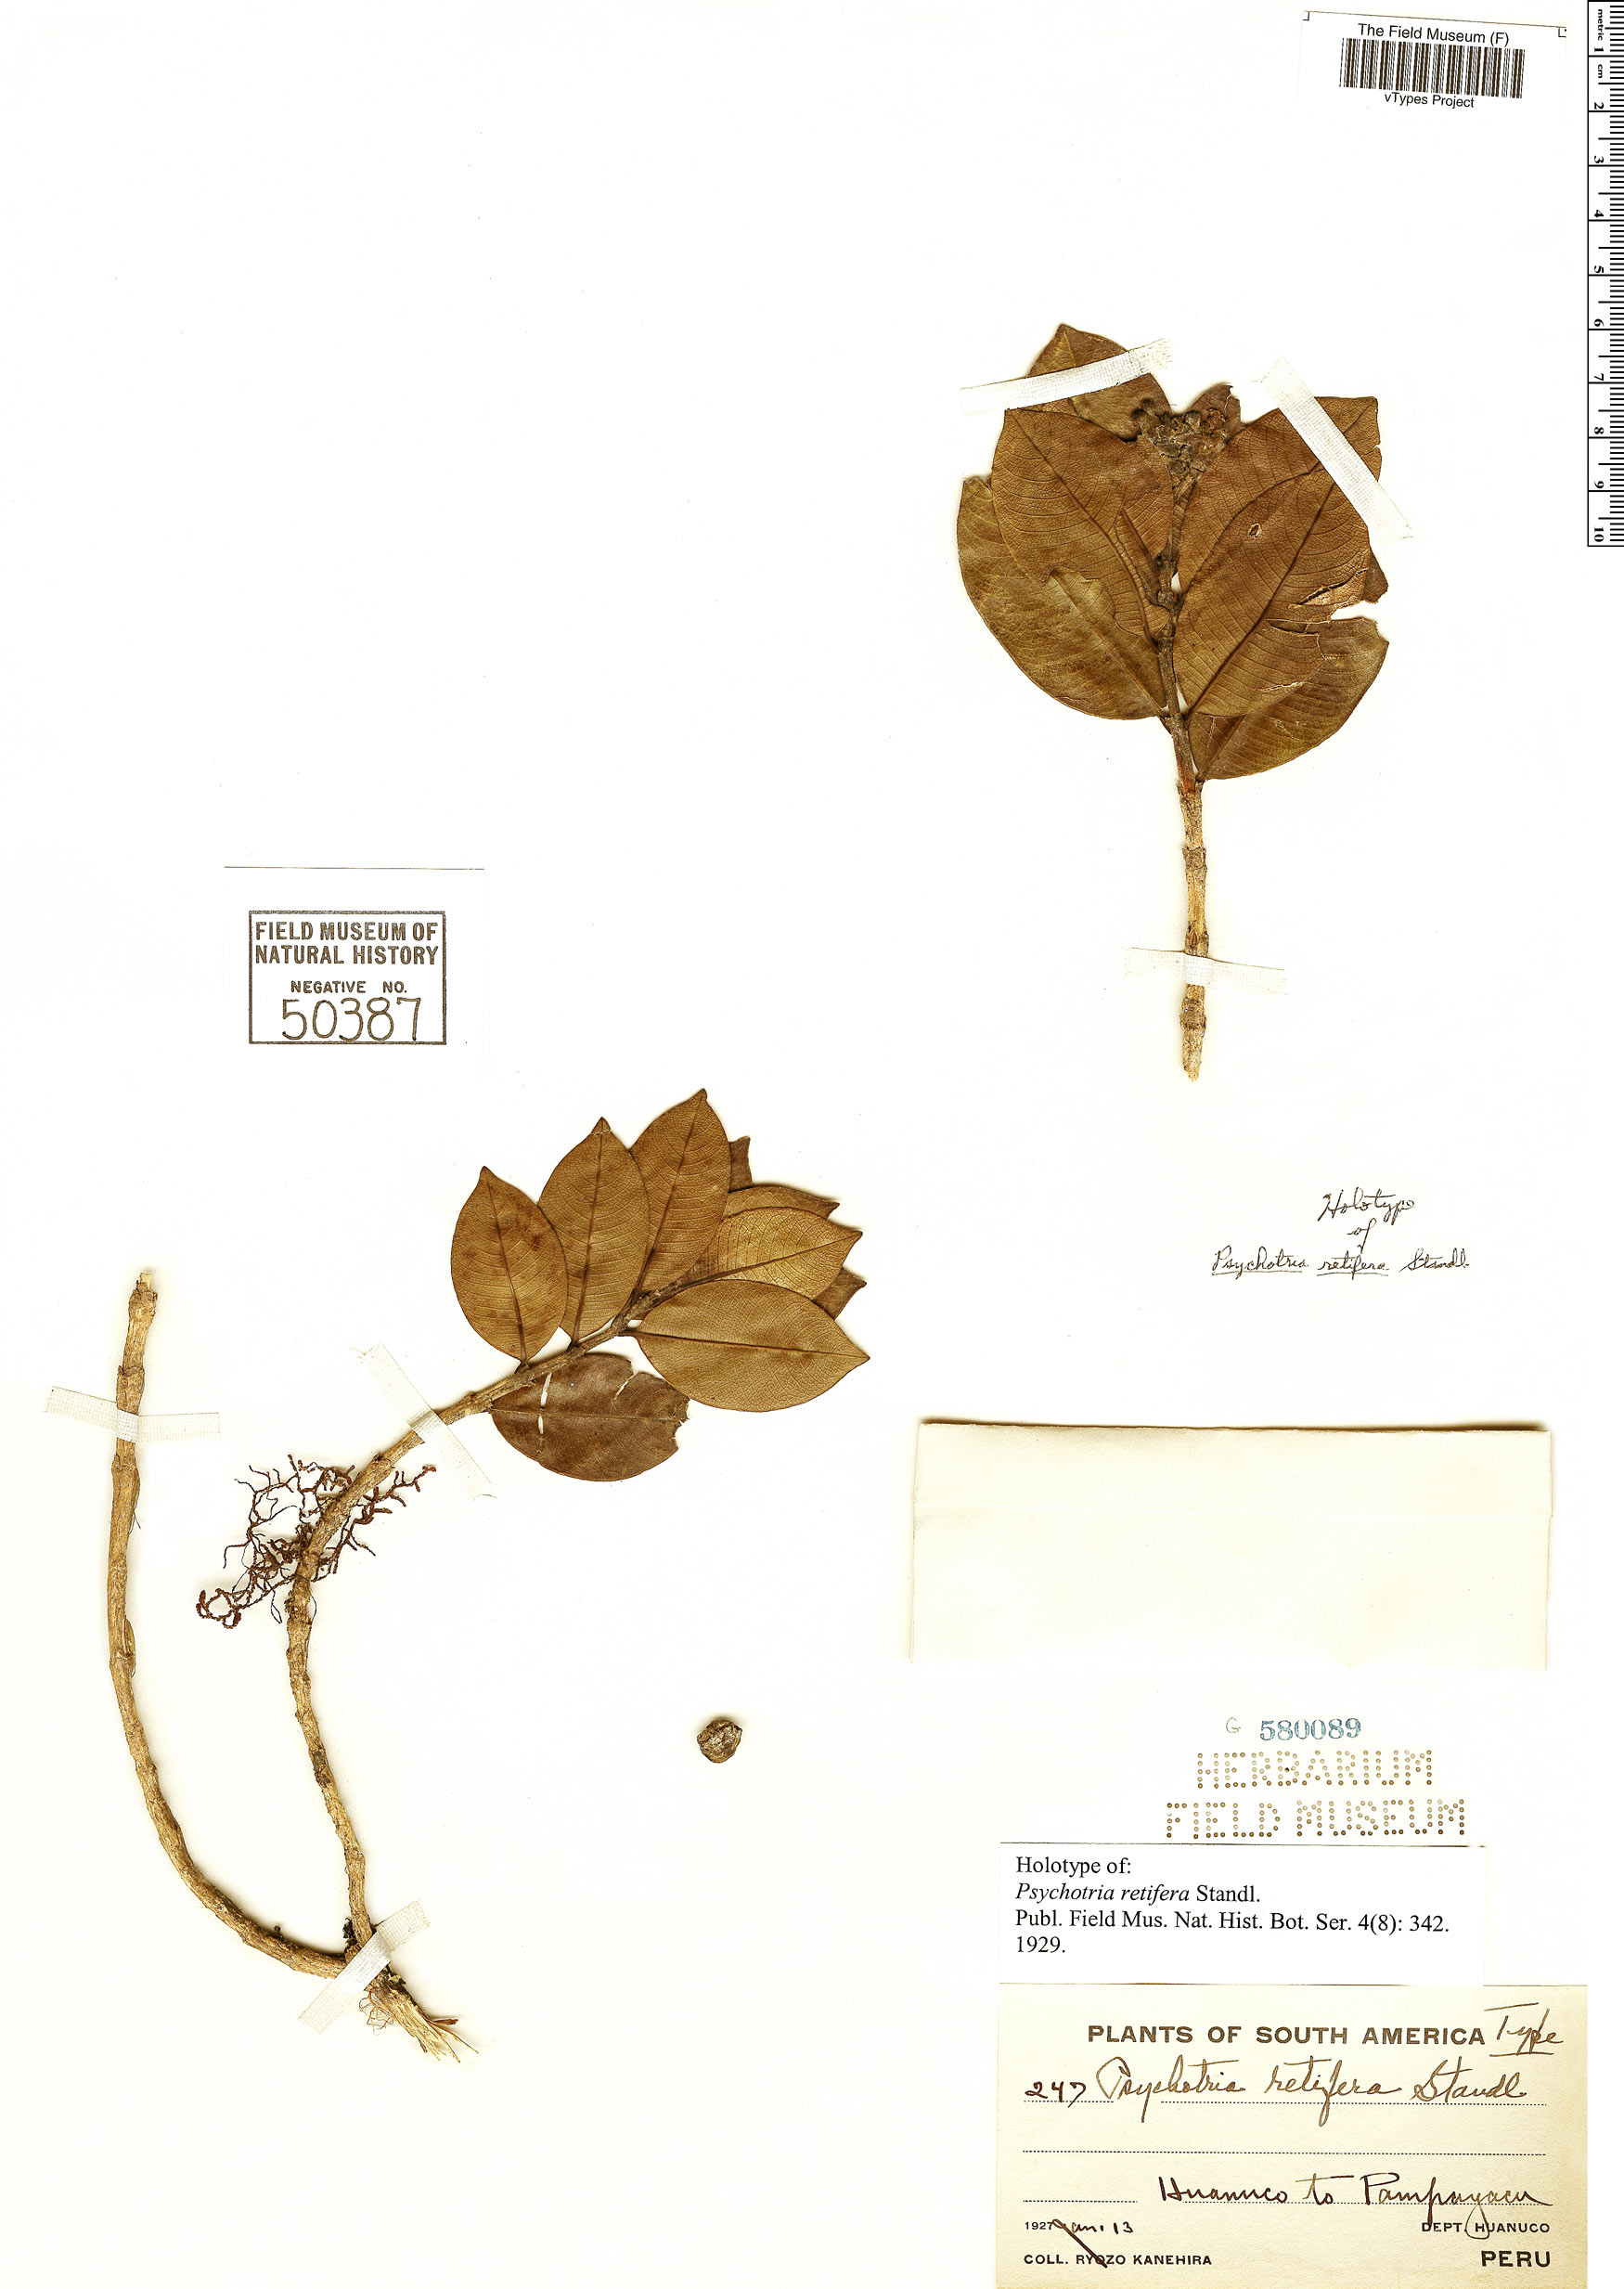 Specimen: Psychotria retifera